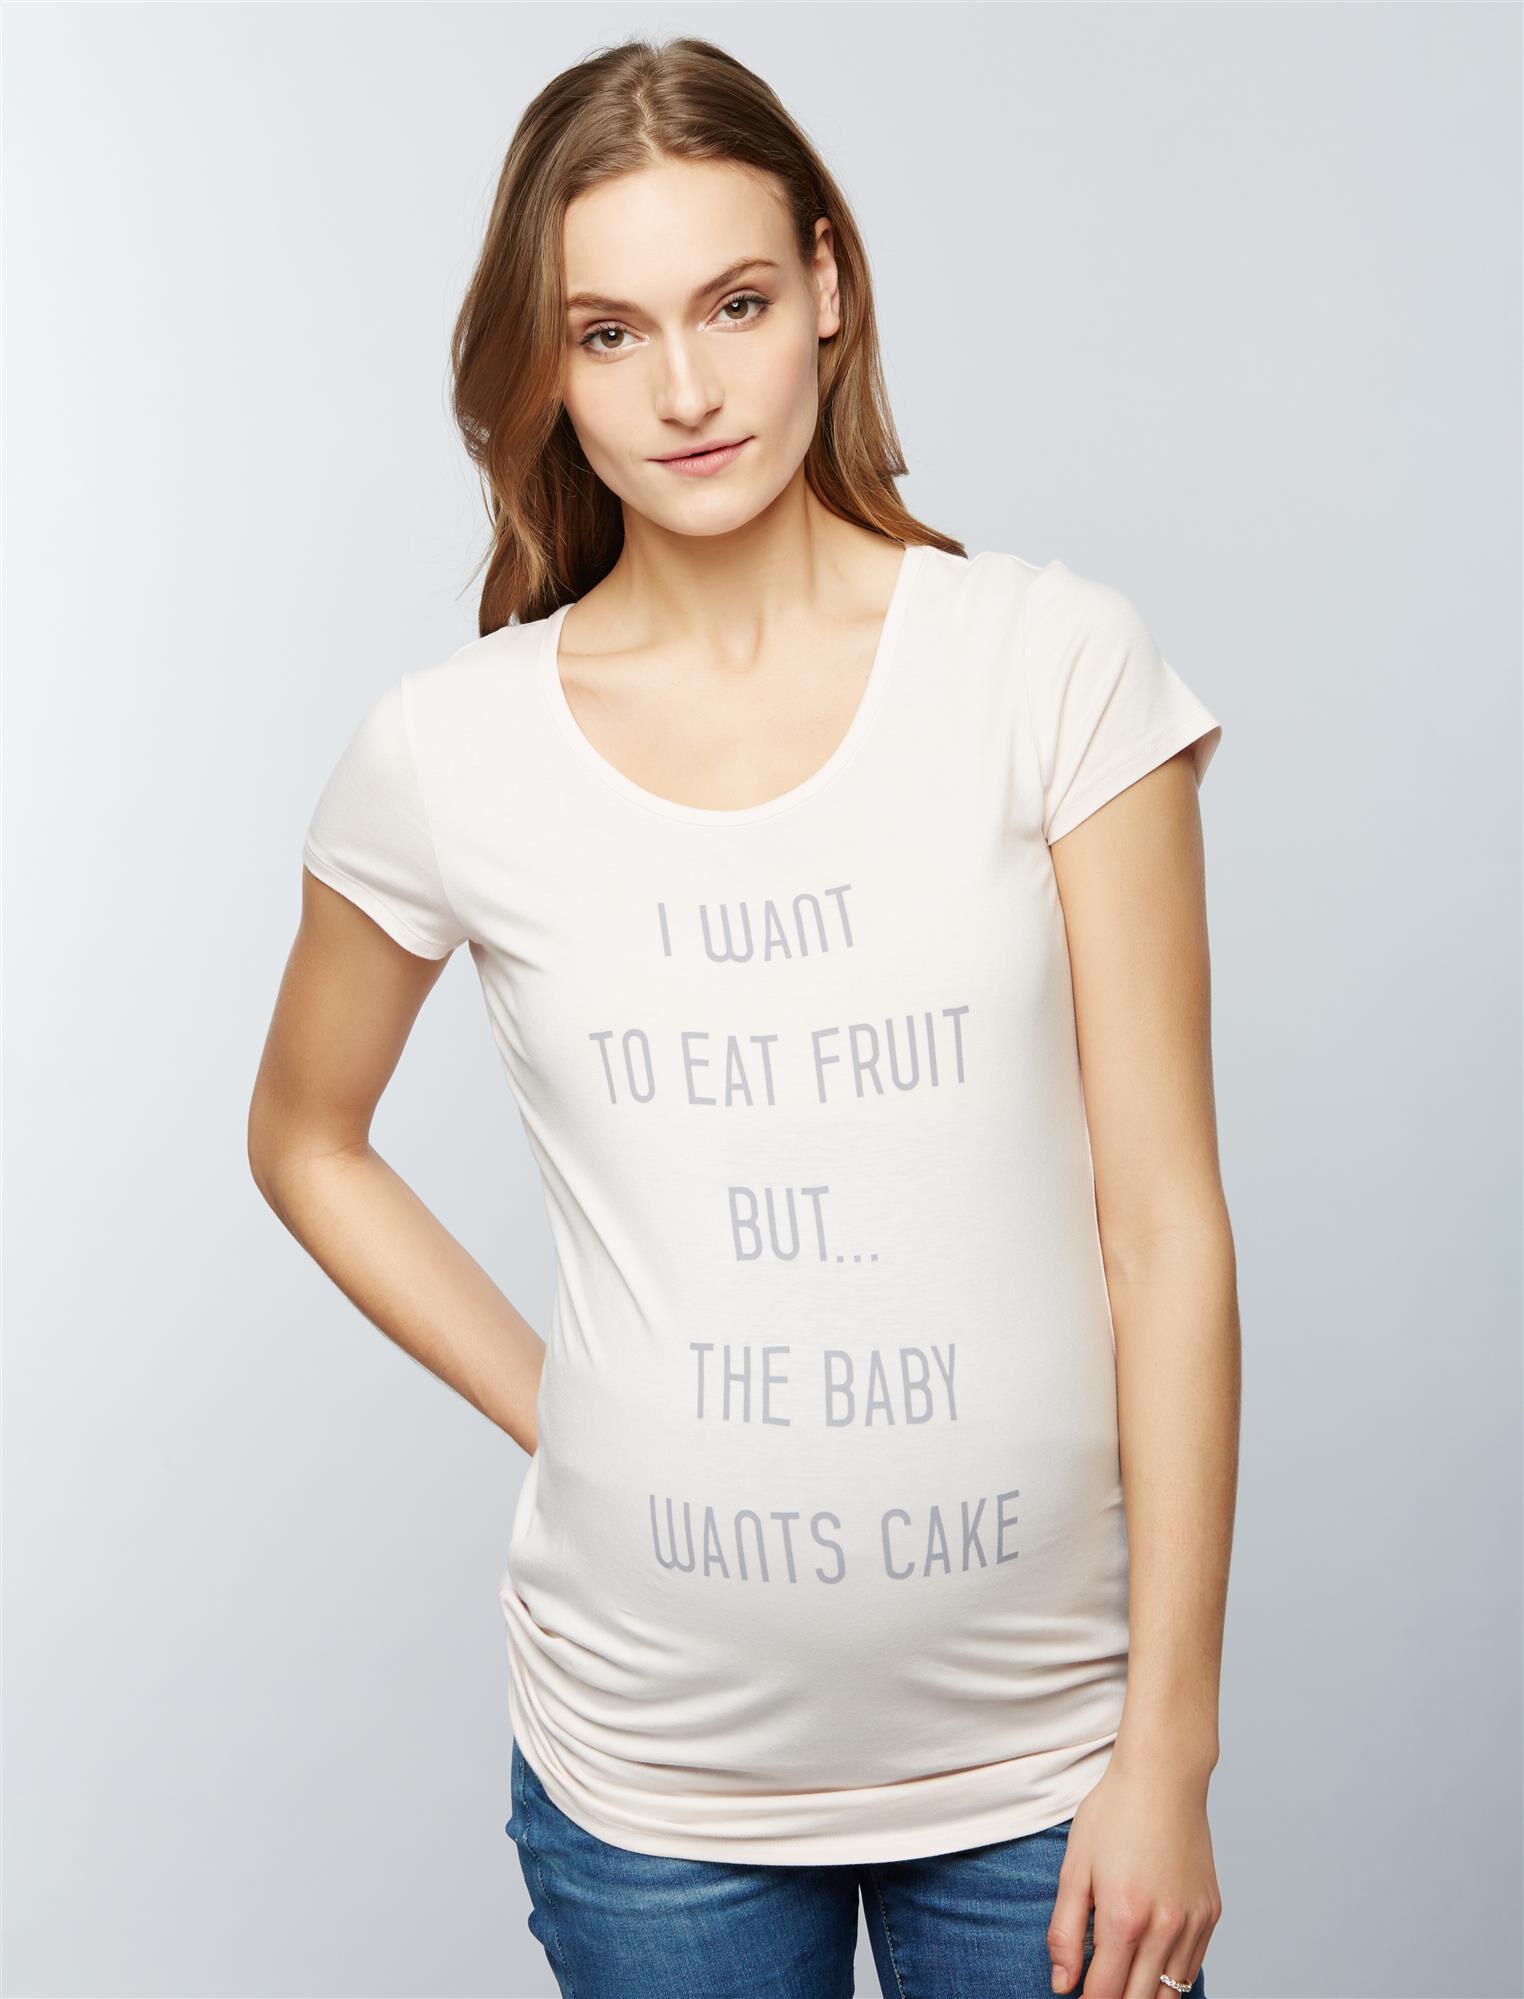 Baby Wants Cake Maternity Tee